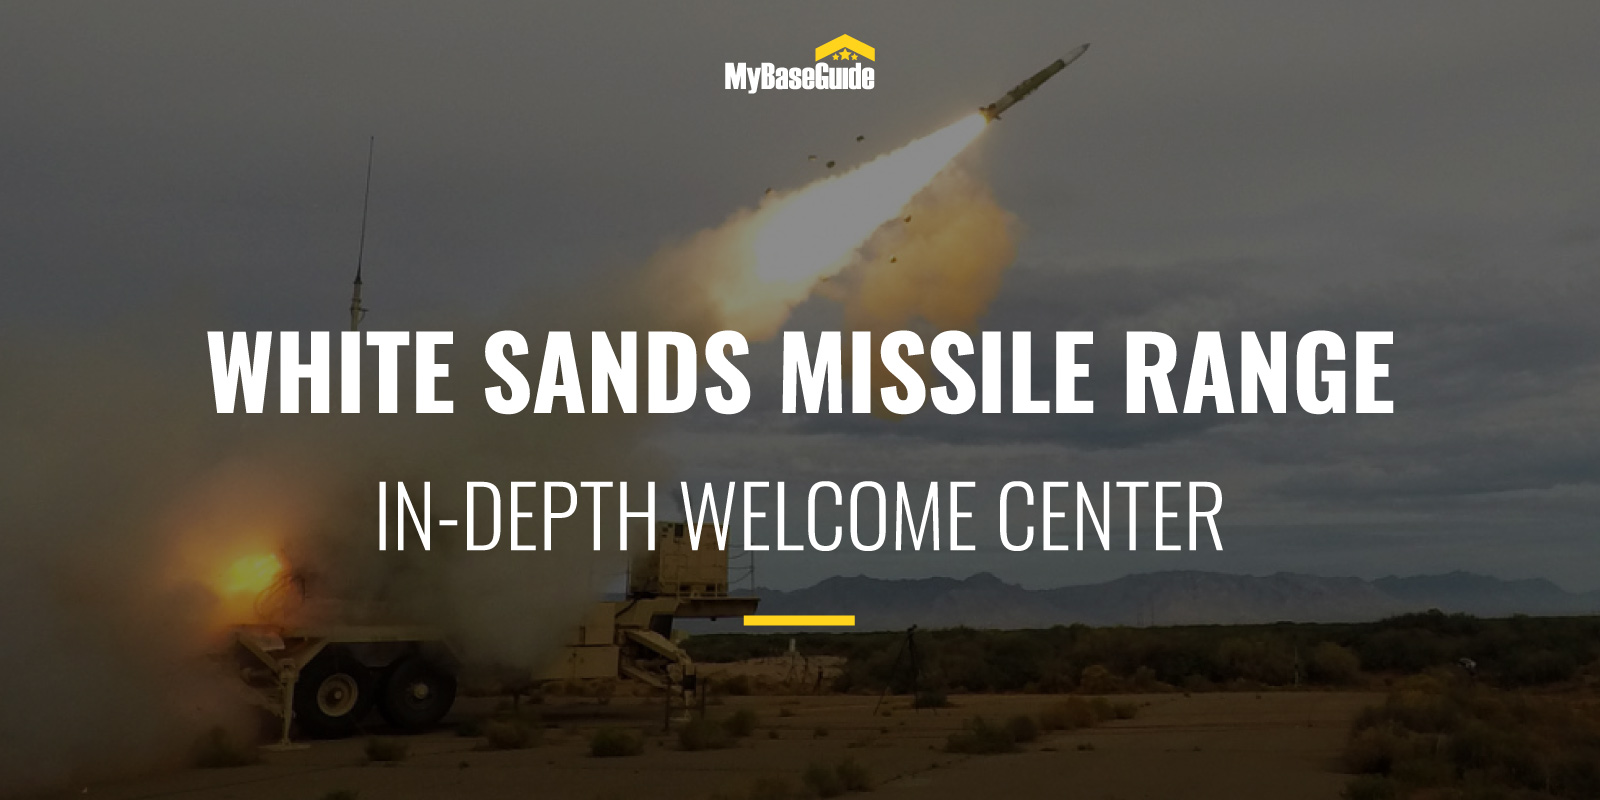 White Sands Missile Range: In-Depth Welcome Center